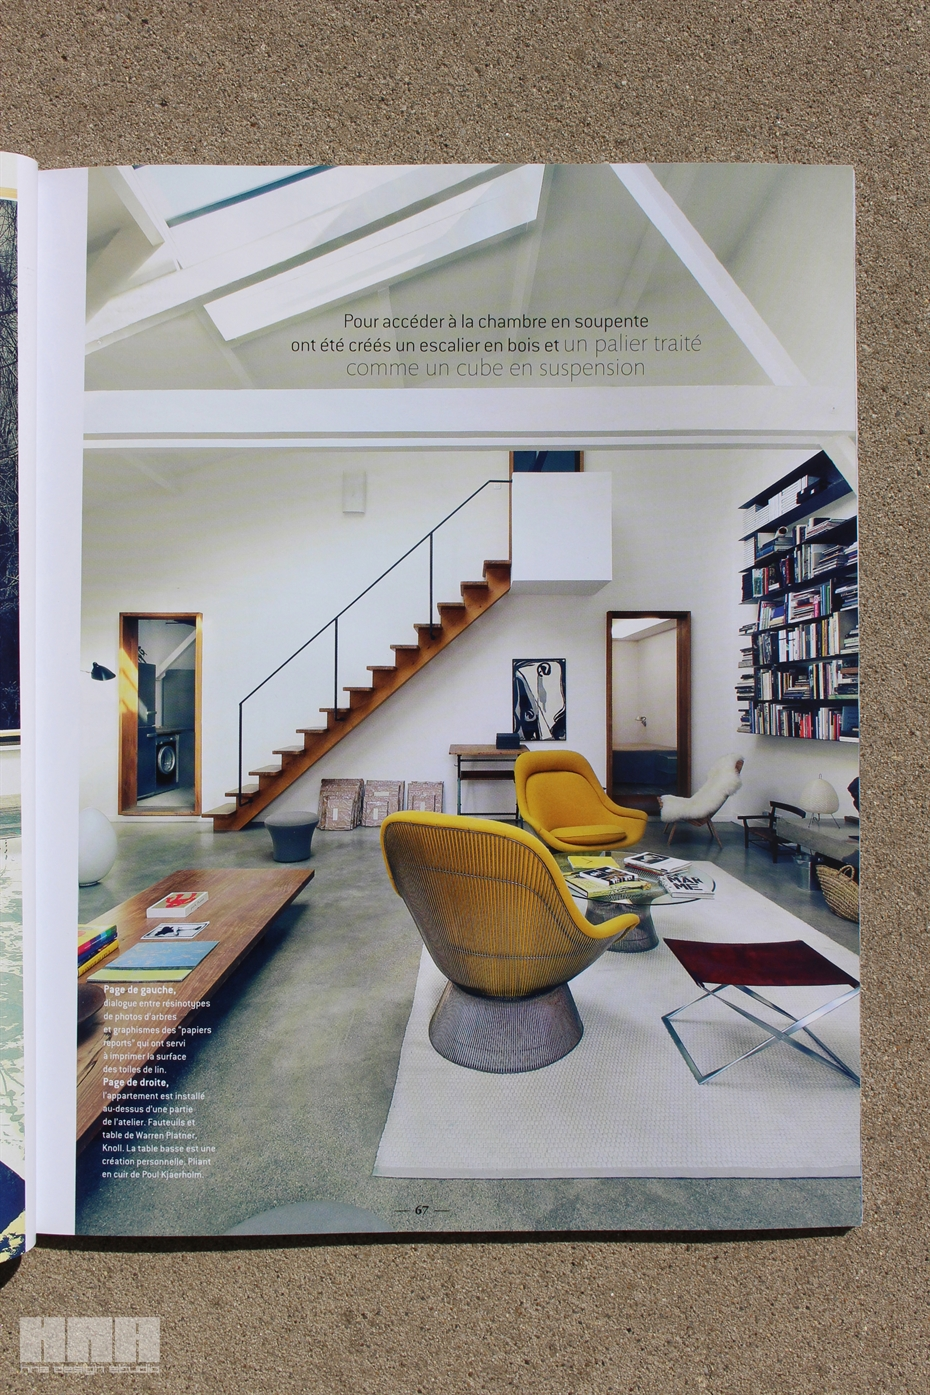 hna design inspiralo magazinok paris 9